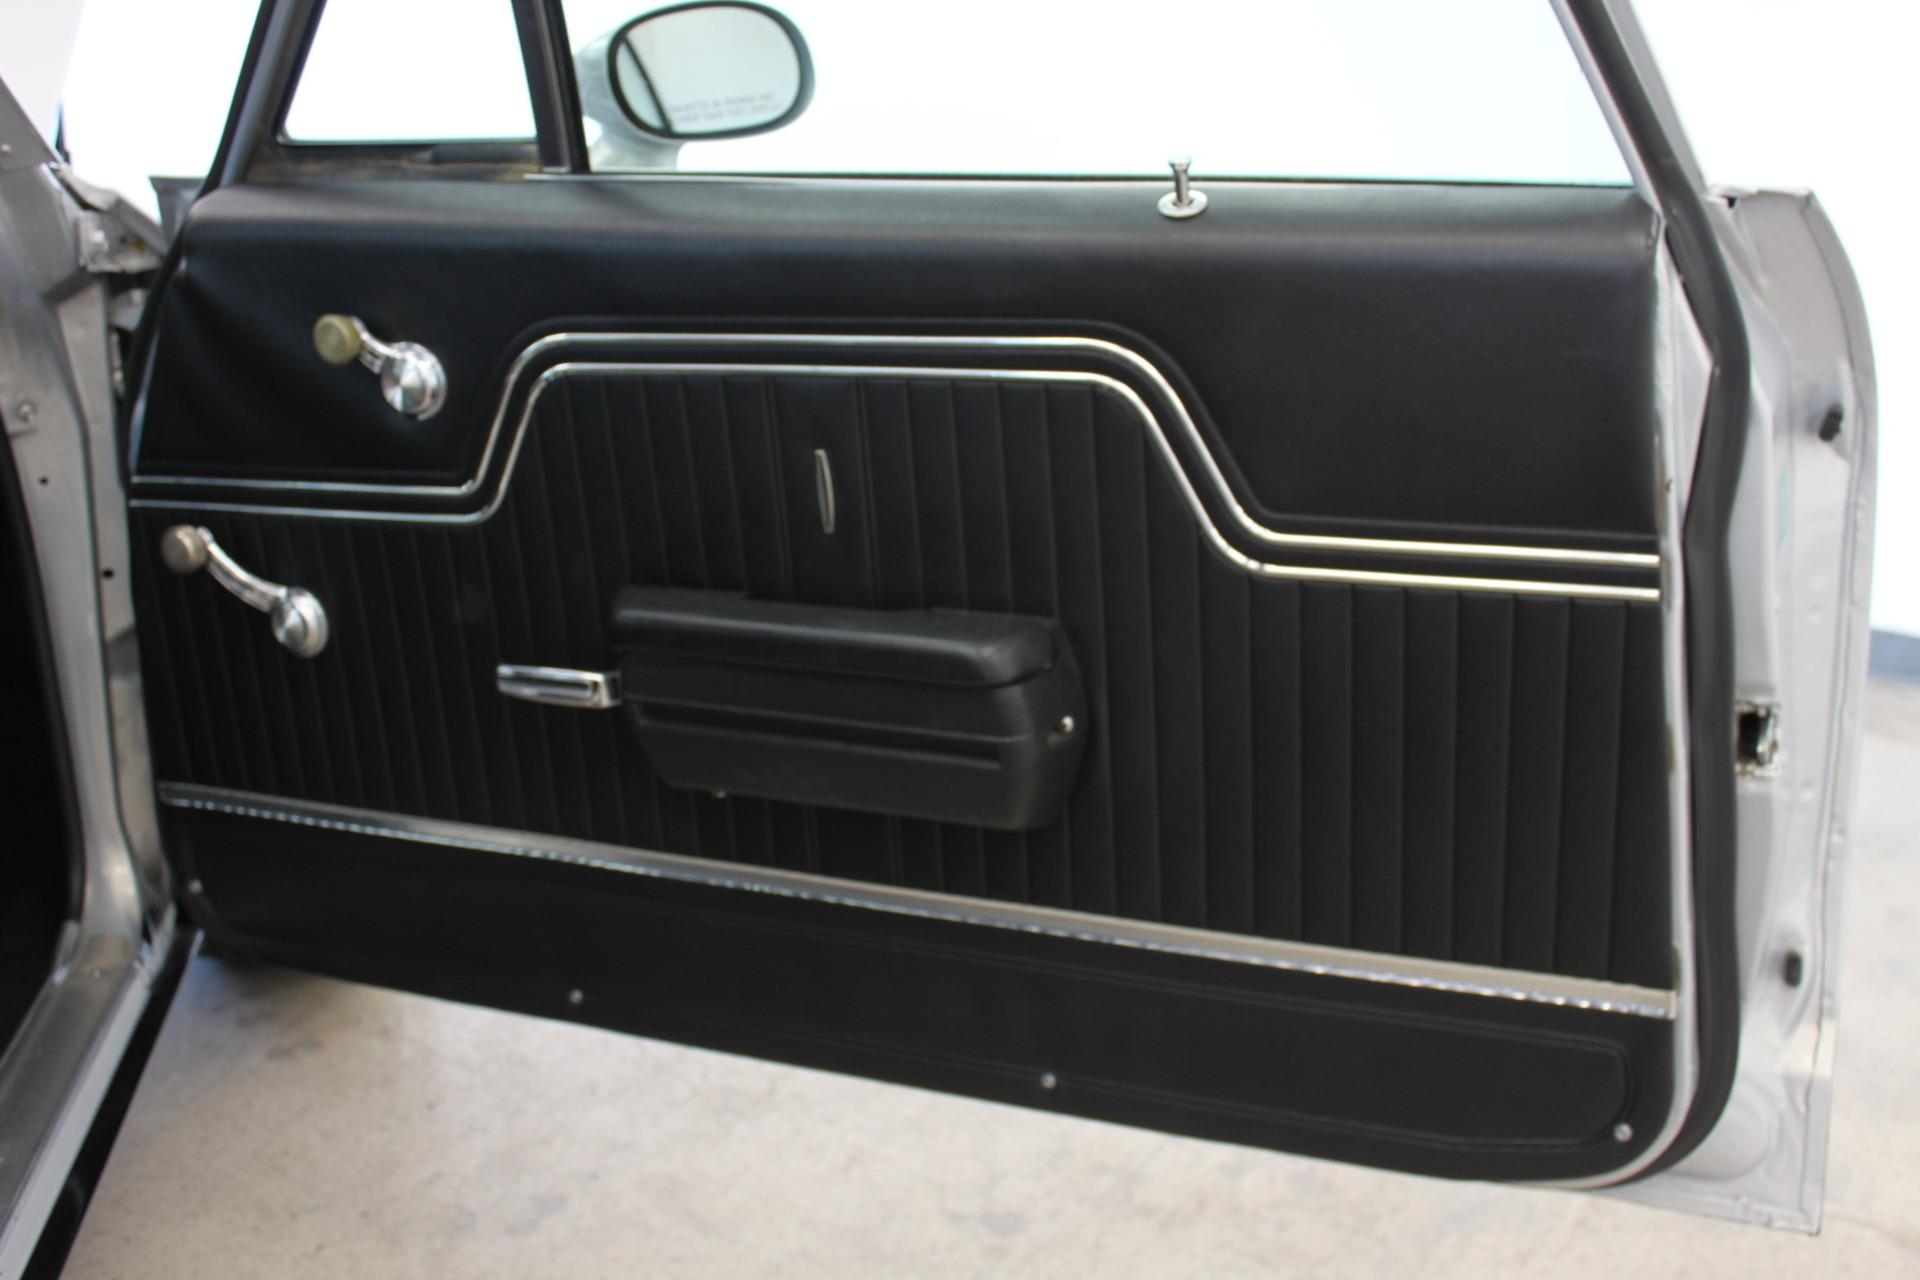 Used-1970-Chevrolet-El-Camino-Custom-350-ci-Acura